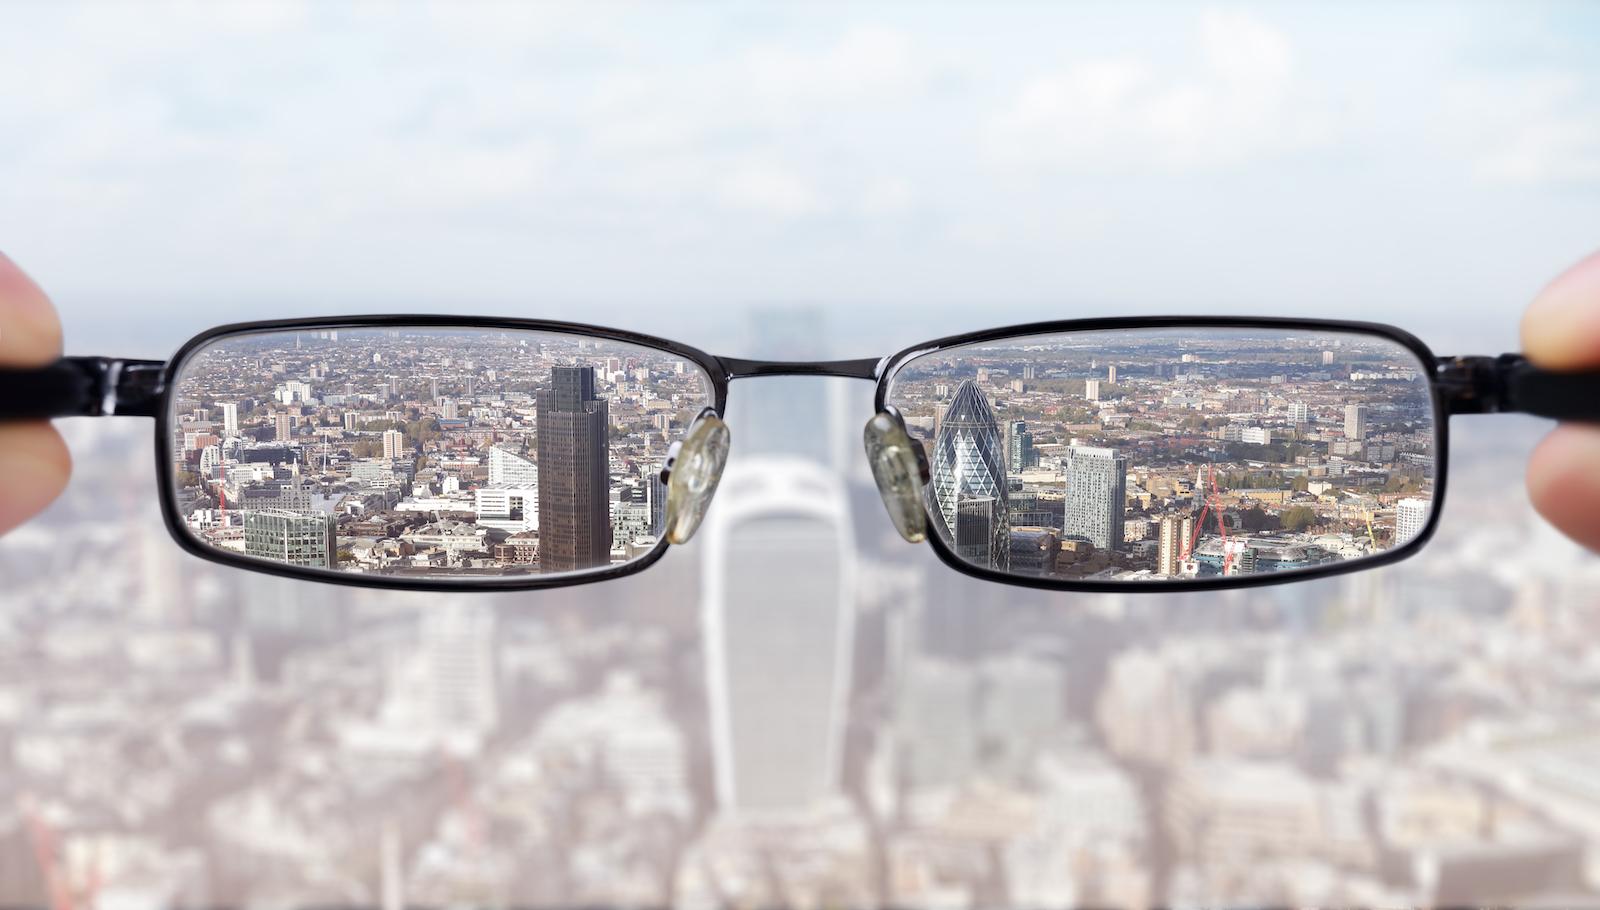 oftalmologie bucuresti ilfov